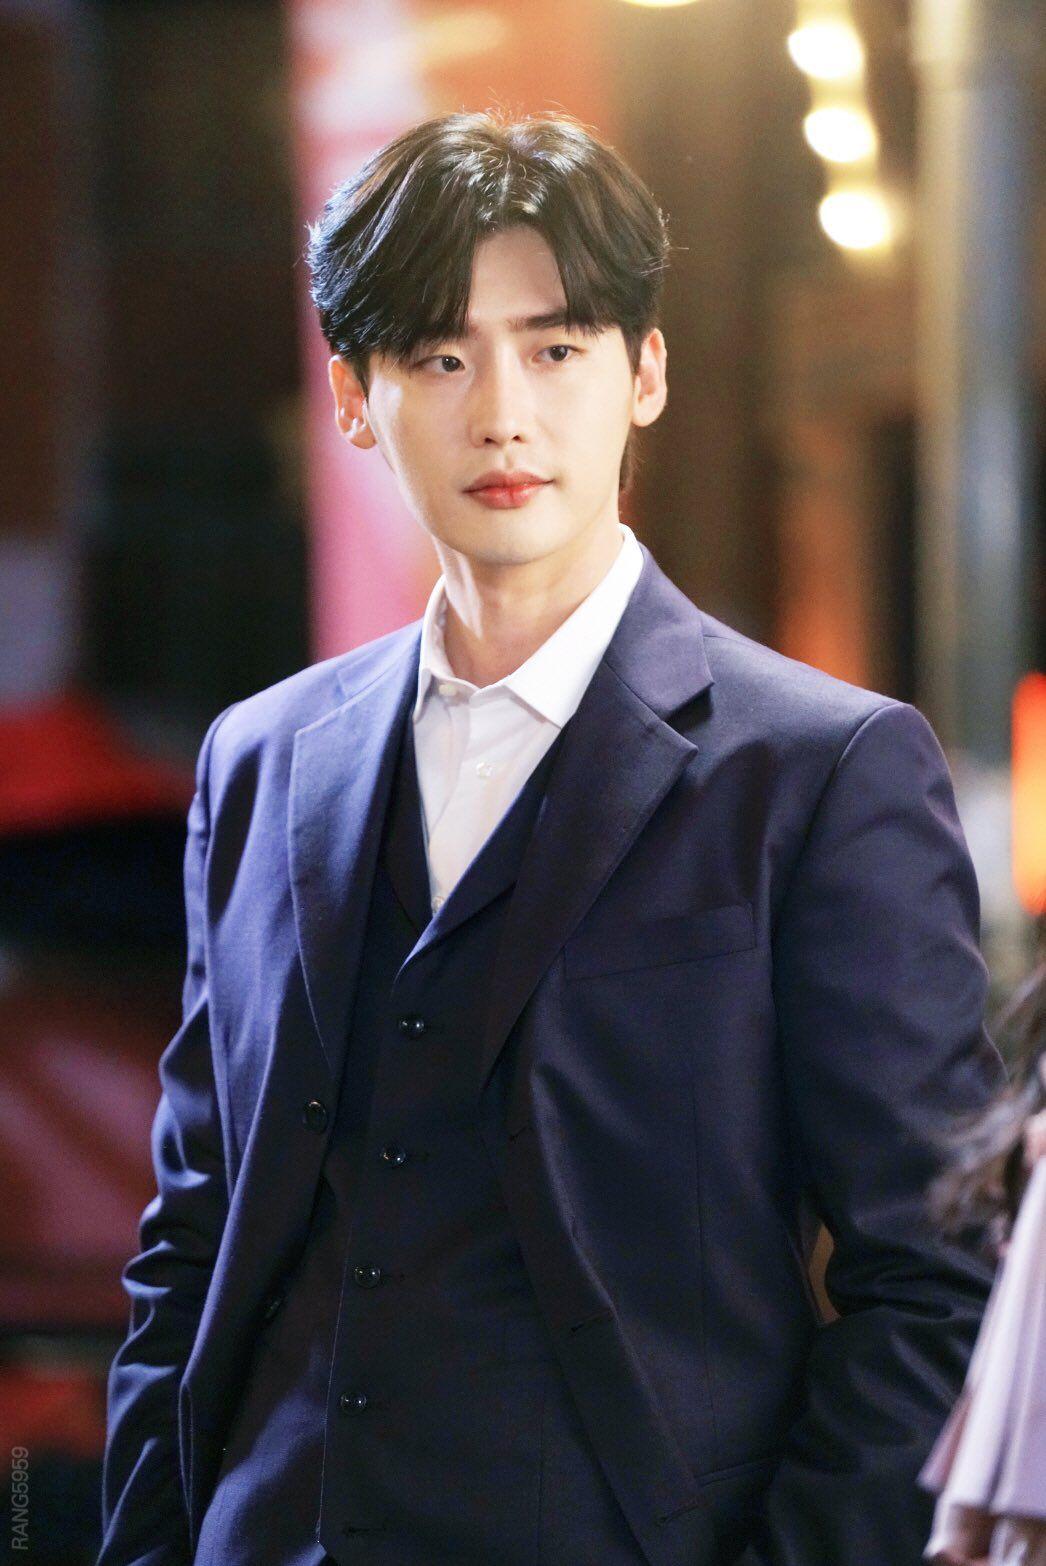 Pin by Leejongsuk on Babe in 2019   Lee jong, Lee jong suk